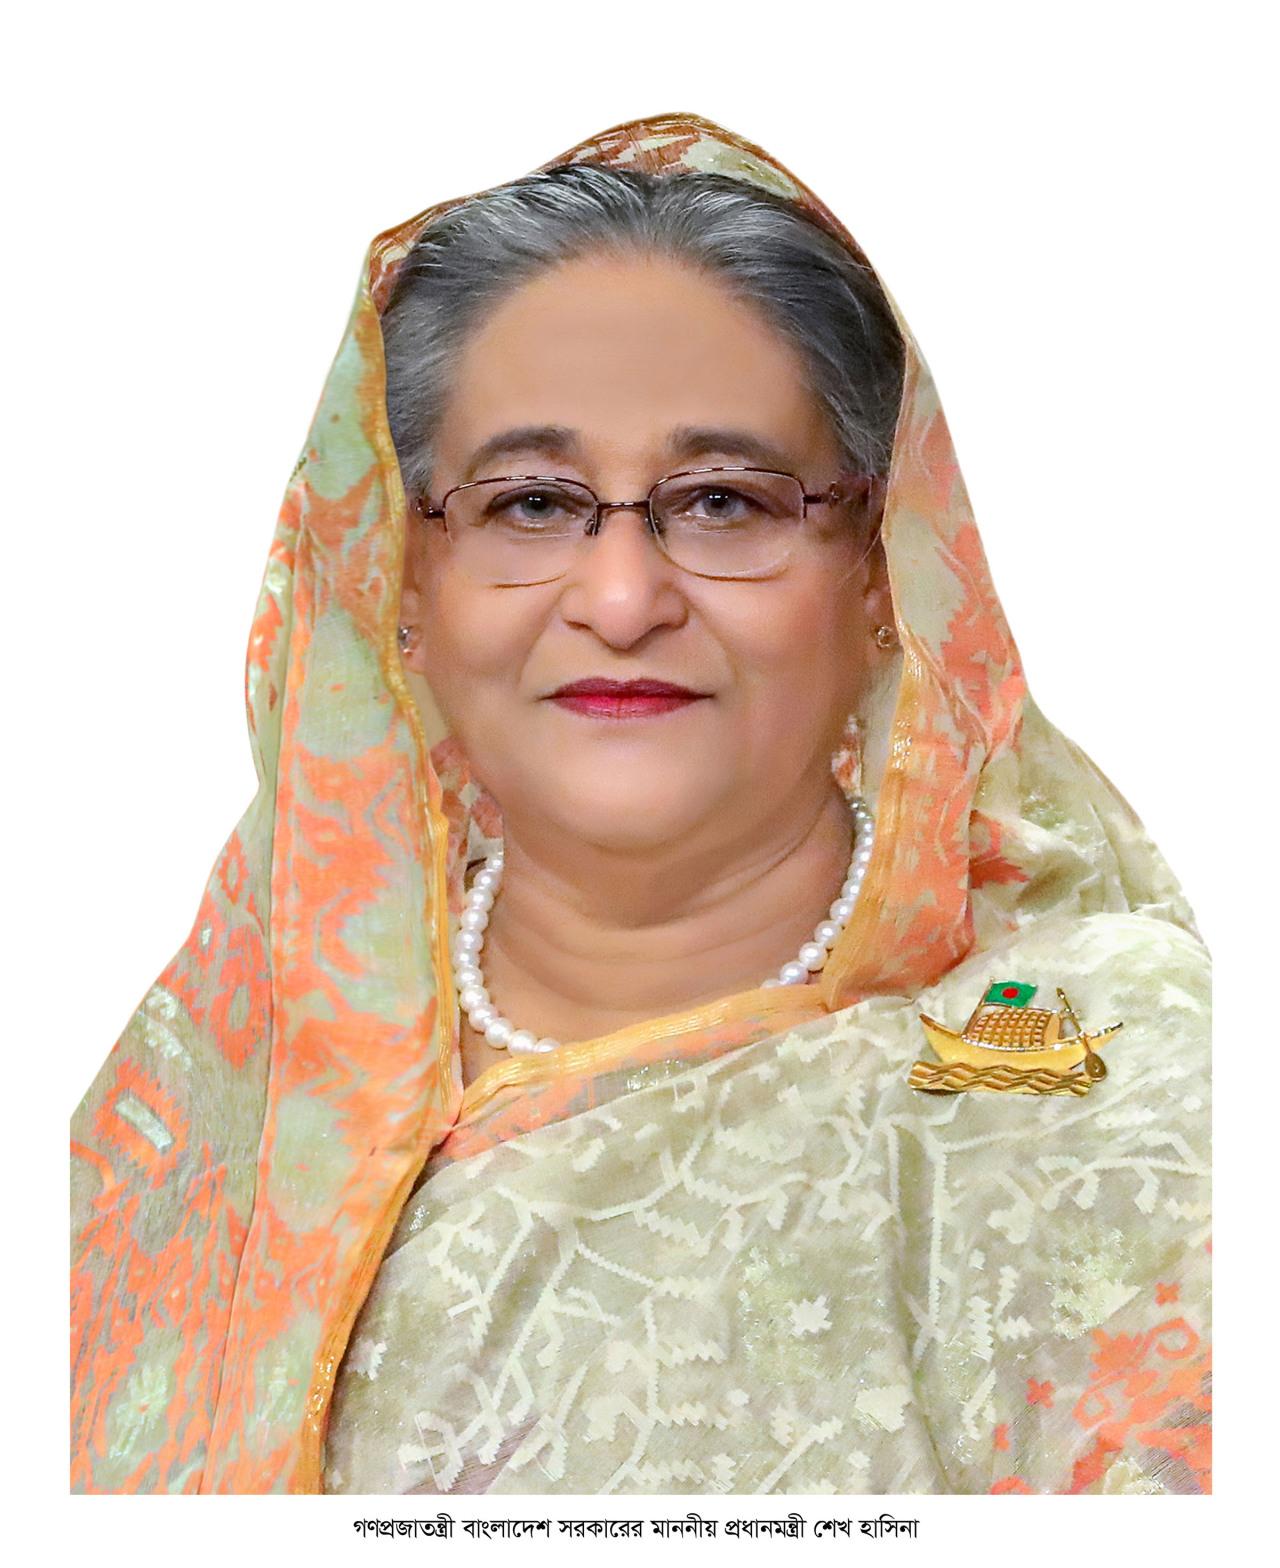 Sheikh Hasina Hon'ble Prime Minister of Bangladesh